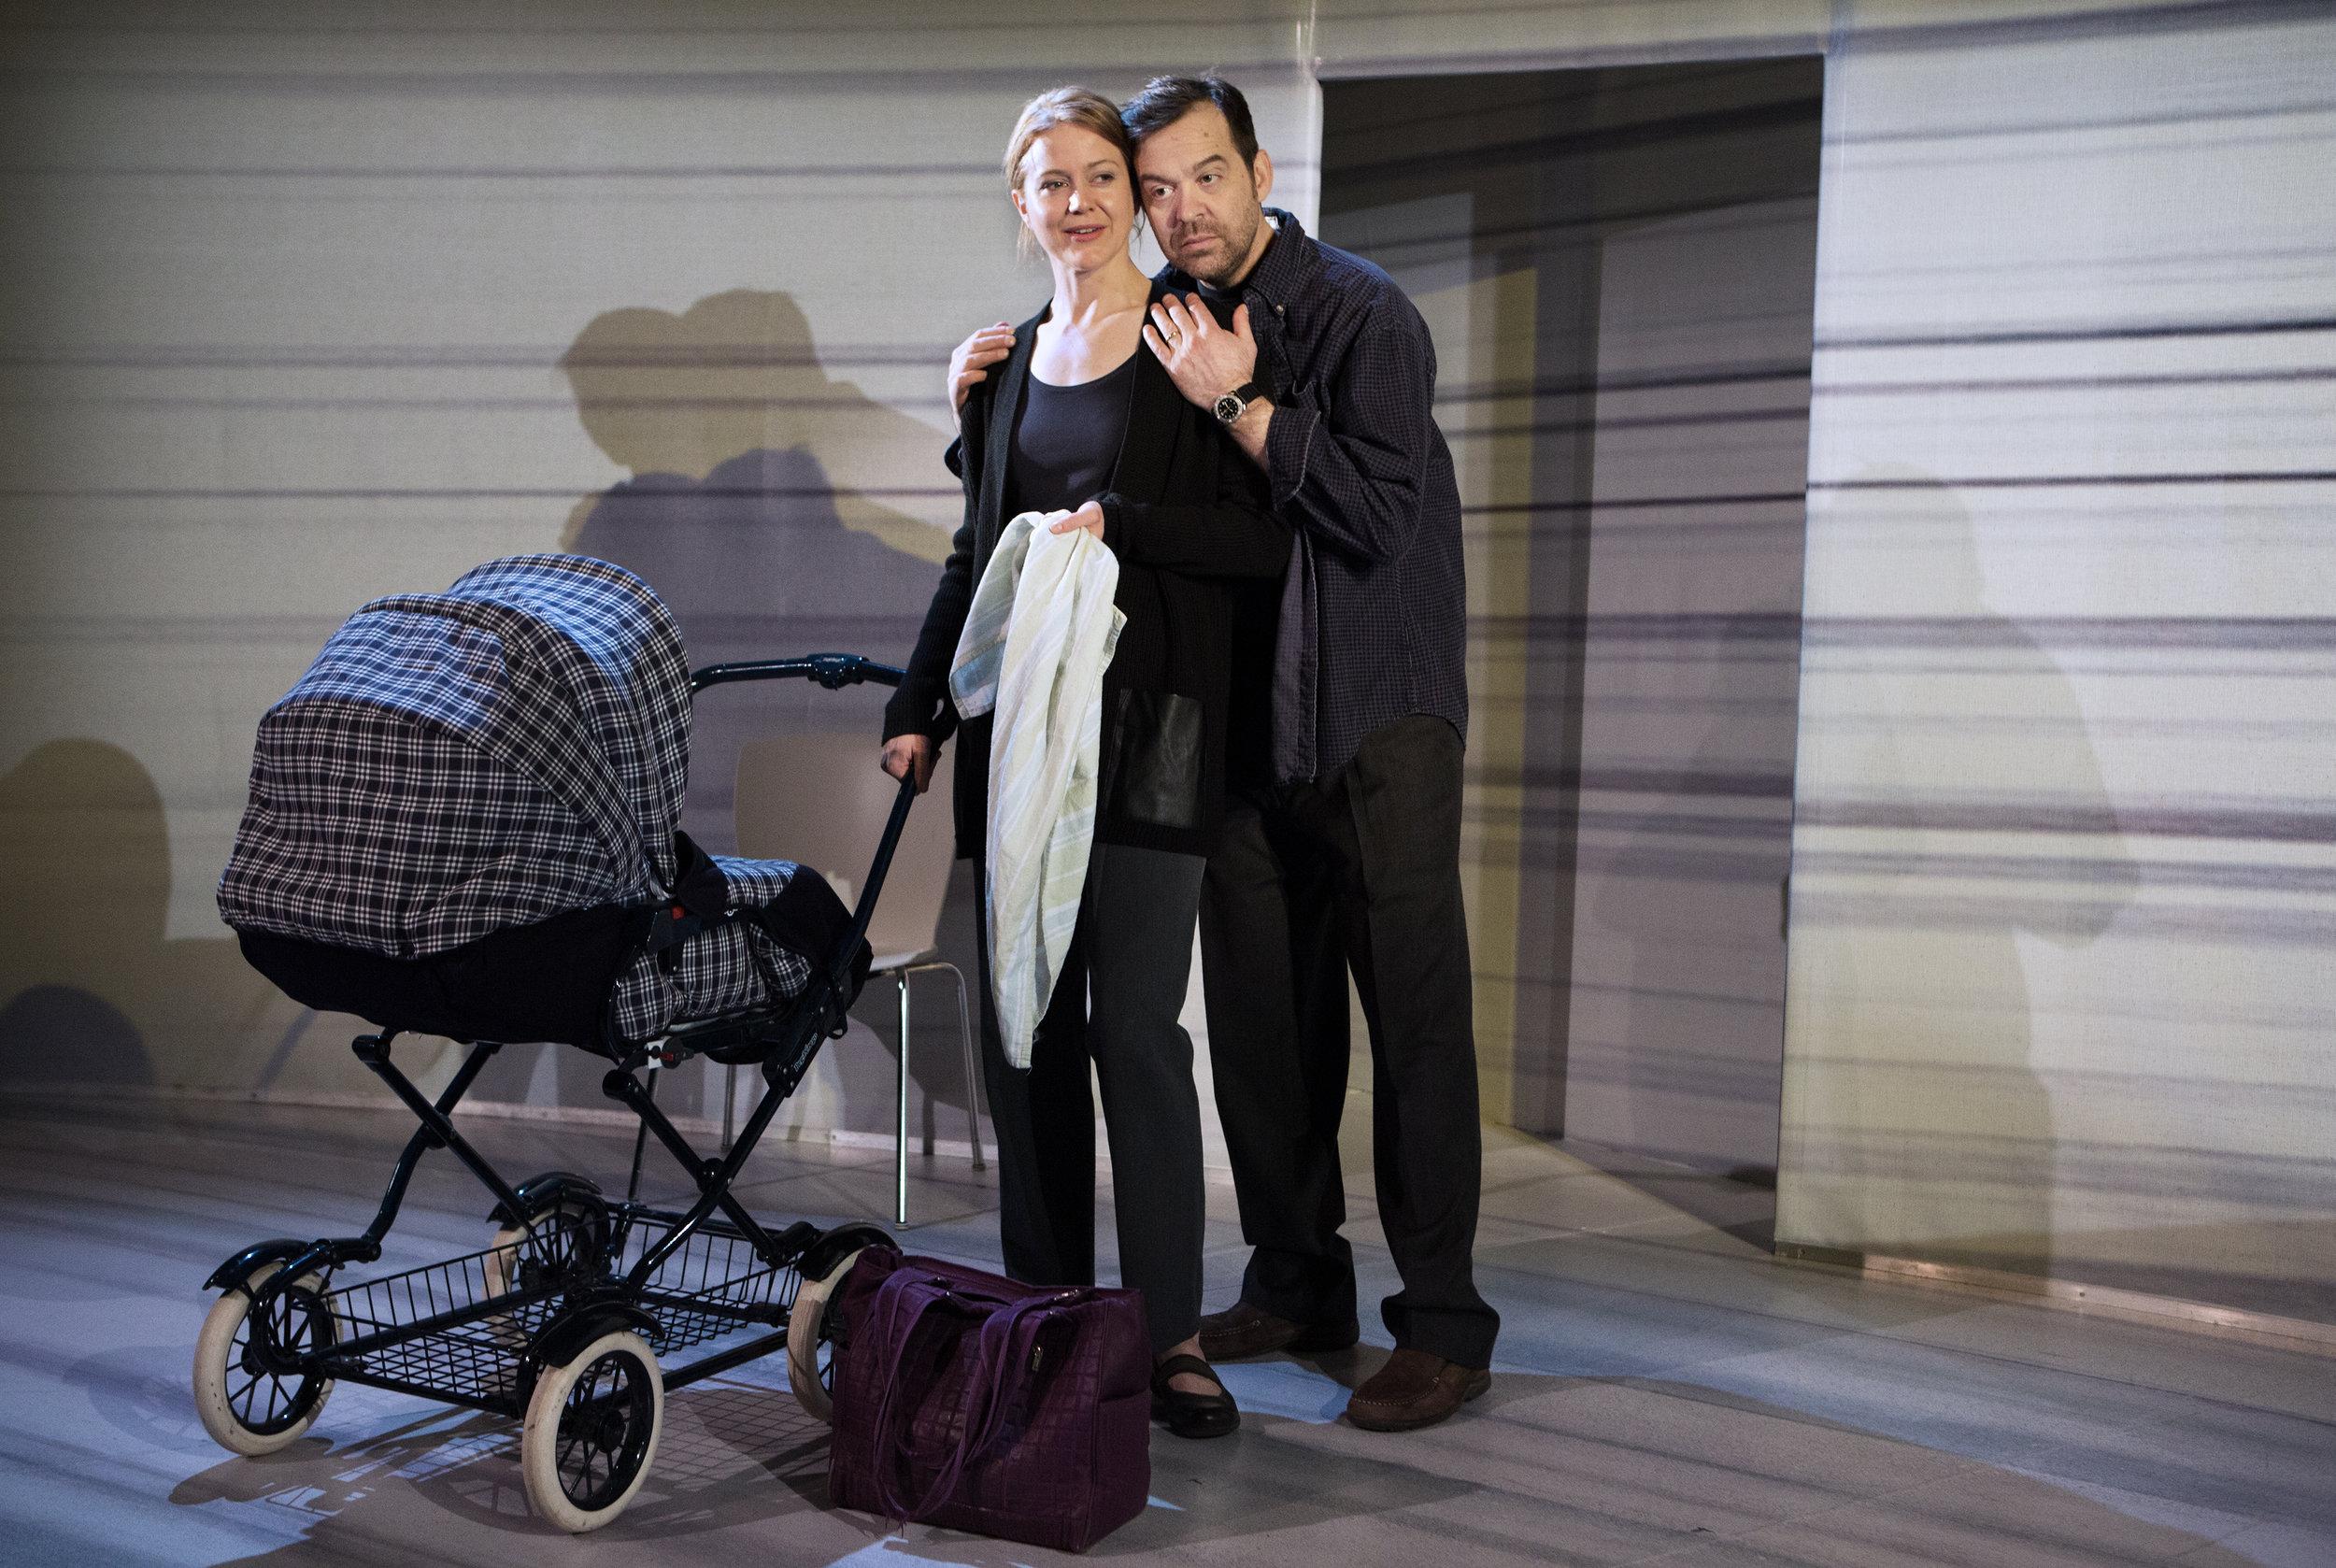 Amy Rutherford and Paul Braunstein, Photography by Cylla von Tiedemann